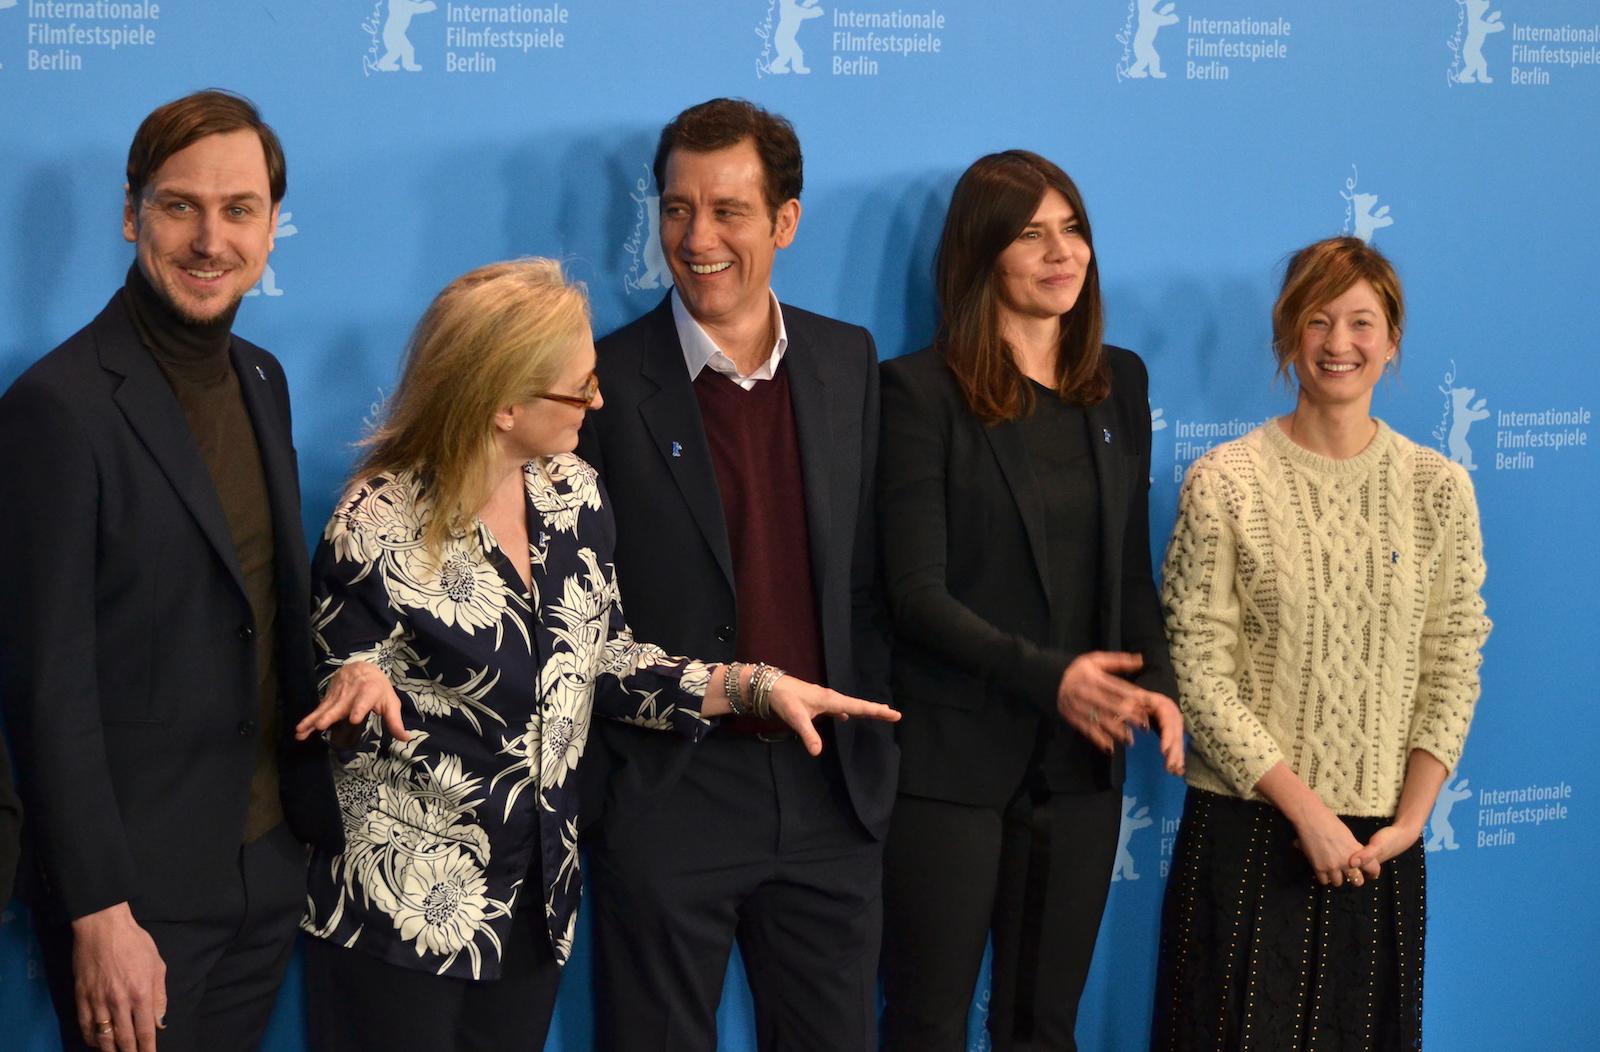 Berlino 2016:Meryl Streep, Clive Owen, Małgorzata Szumowska, Lars Eidinger e Alba Rohrwacher al photocall della giuria